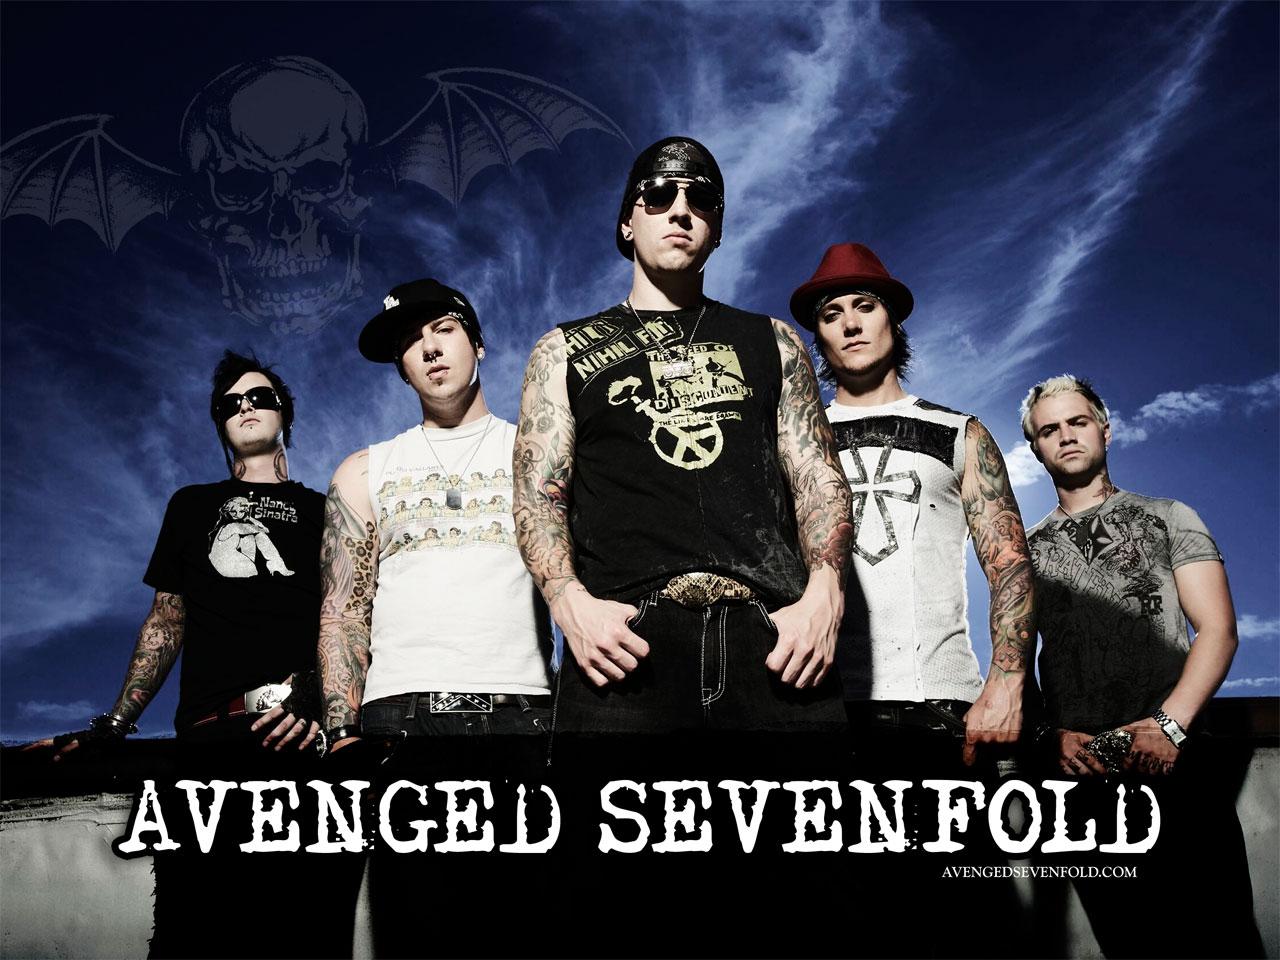 http://4.bp.blogspot.com/_UHfhm5_IRdM/TIFHHi_iblI/AAAAAAAAAqY/RSdcx8iv-Qc/s1600/avenged-sevenfold-2-wallpaper-1.jpg